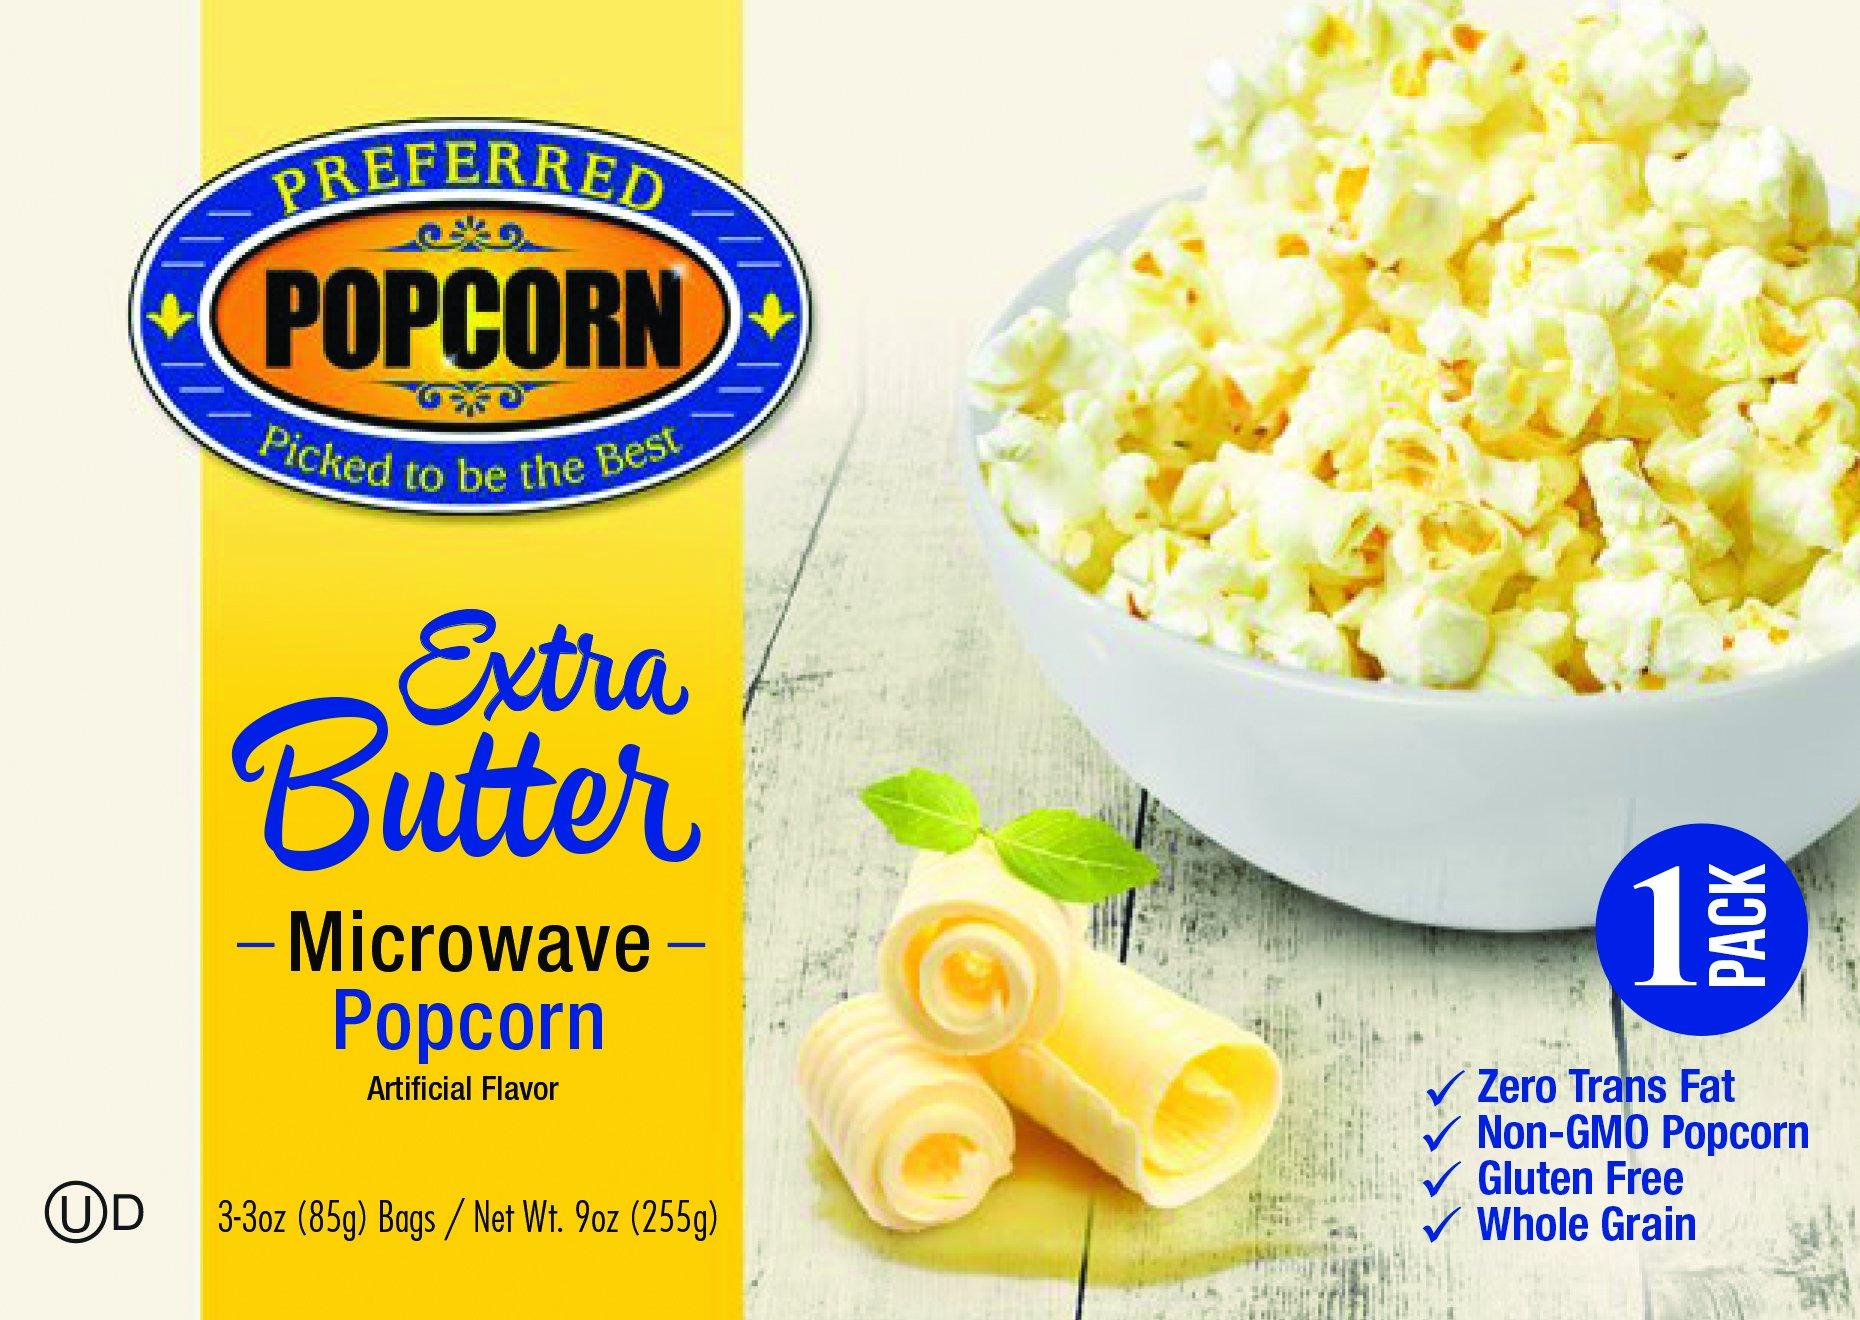 Microwave Extra Butter Popcorn - Preferred Popcorn - One 3.0 oz Bag - 100% Farmer Owned - USA Made - Made in Nebraska - Movie Popcorn Snack - Gluten Free - Whole Grain - NonGMO - Fresh Popcorn